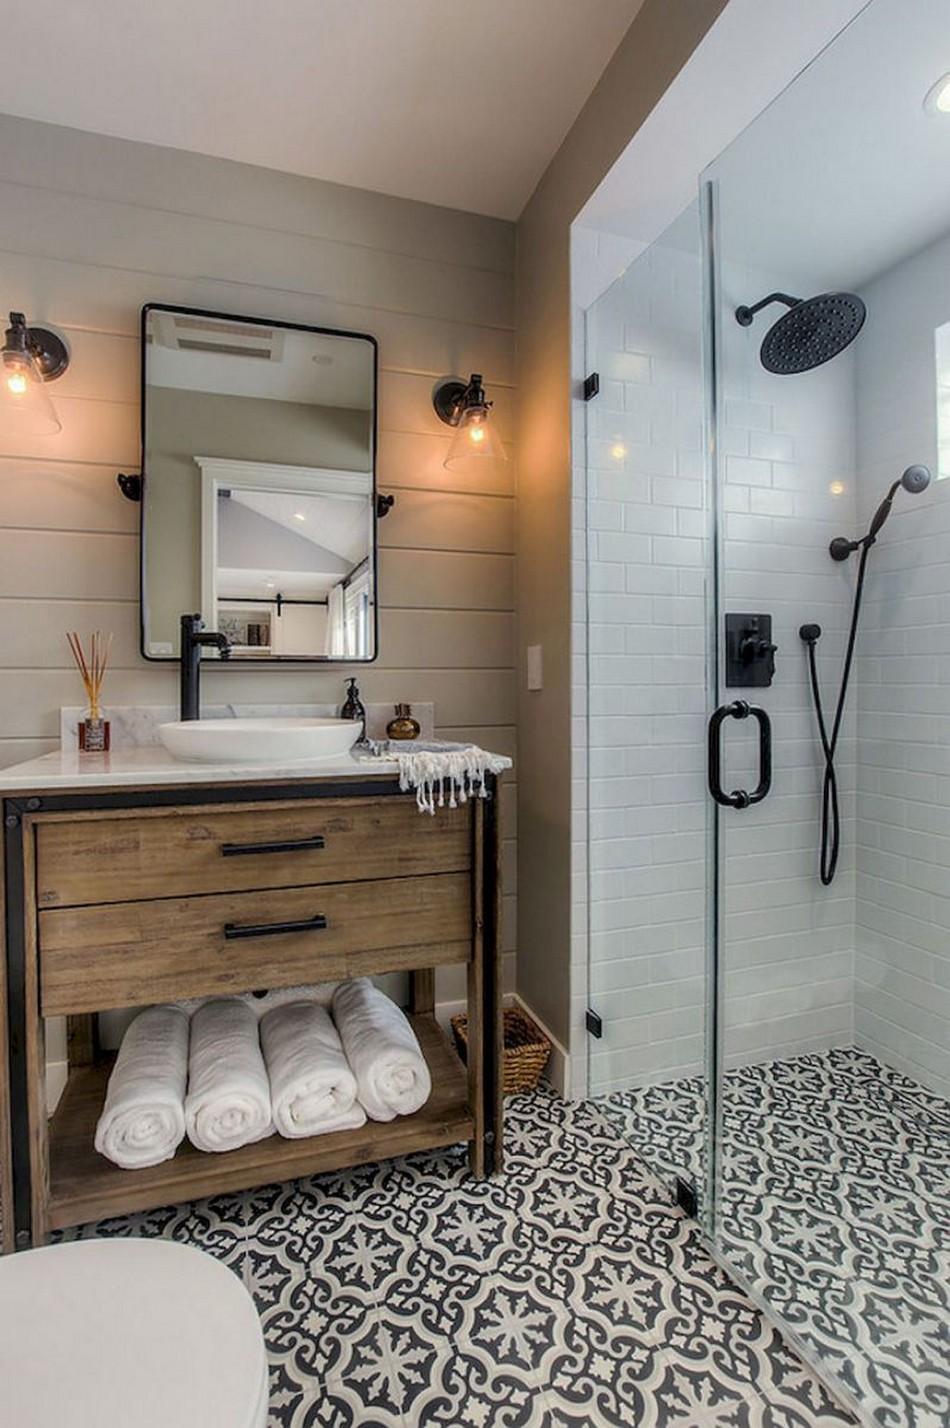 83 Modern Bathroom Design Some Tips Home Decor 22